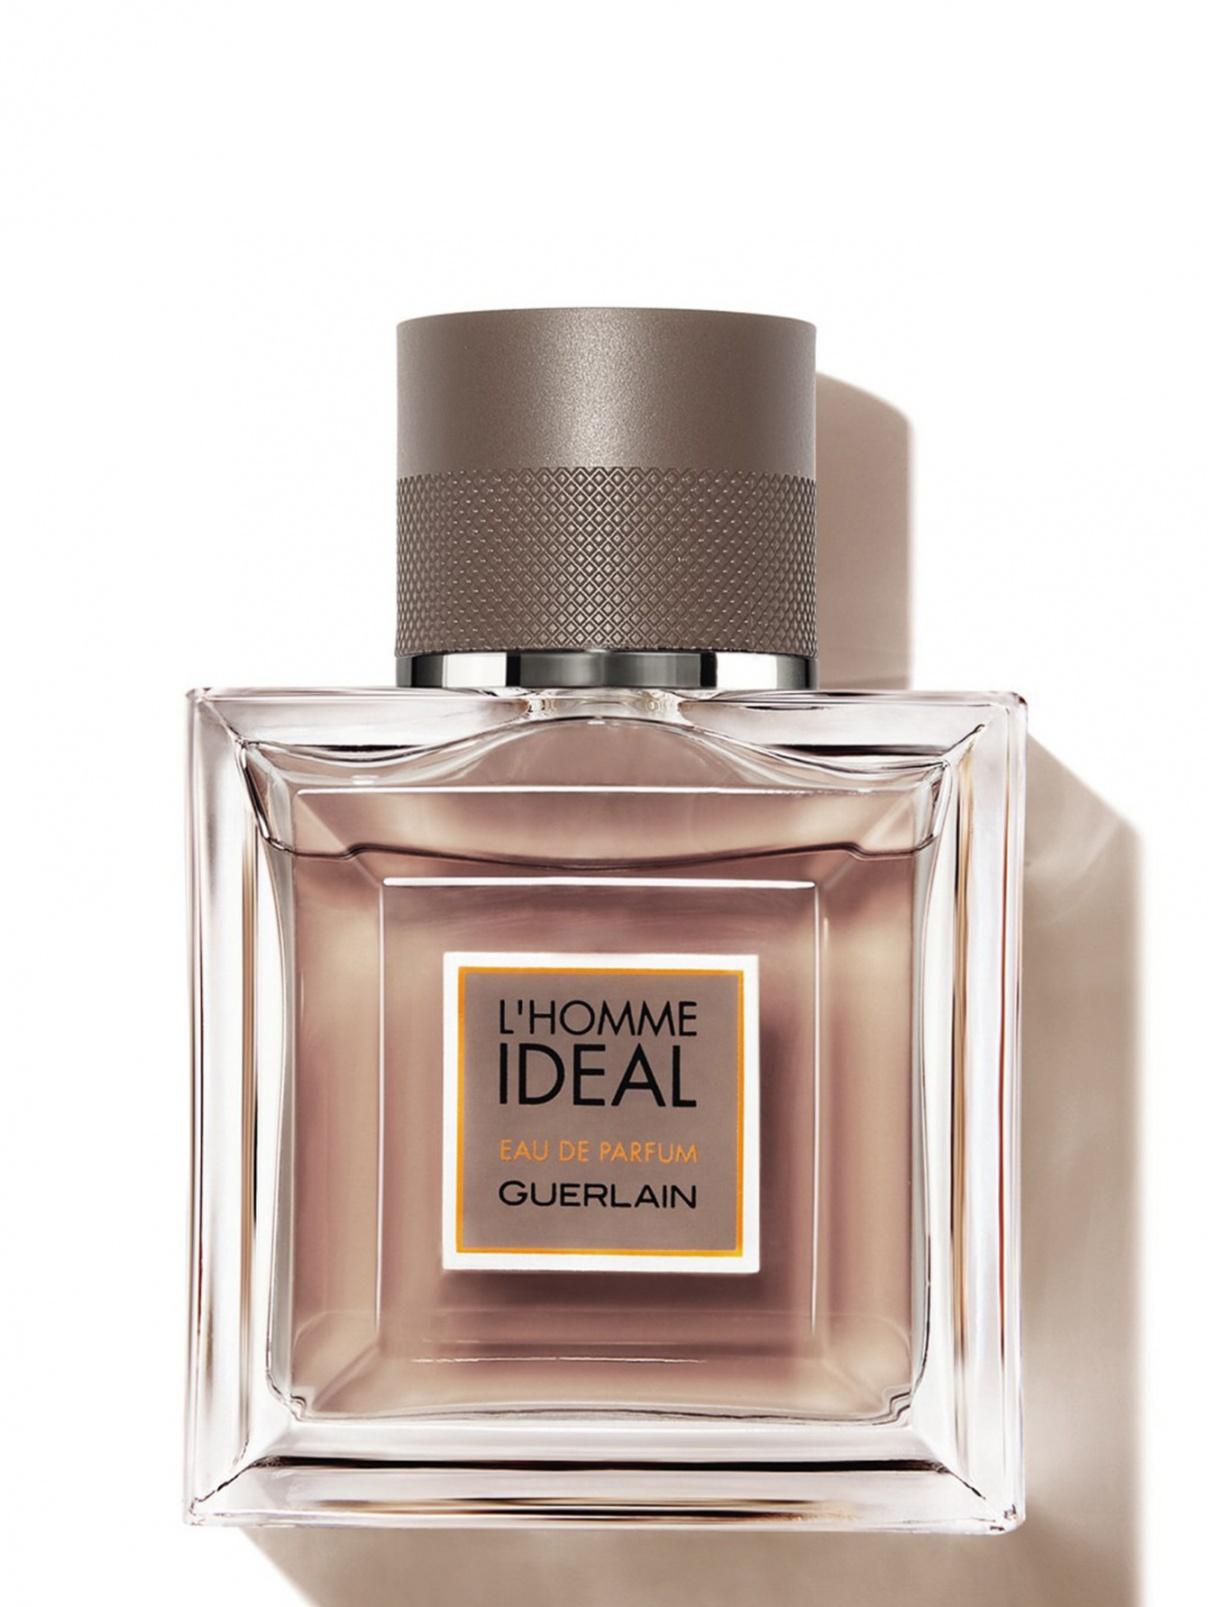 Парфюмерная вода - L'Homme Ideal, 50ml Guerlain  –  Общий вид